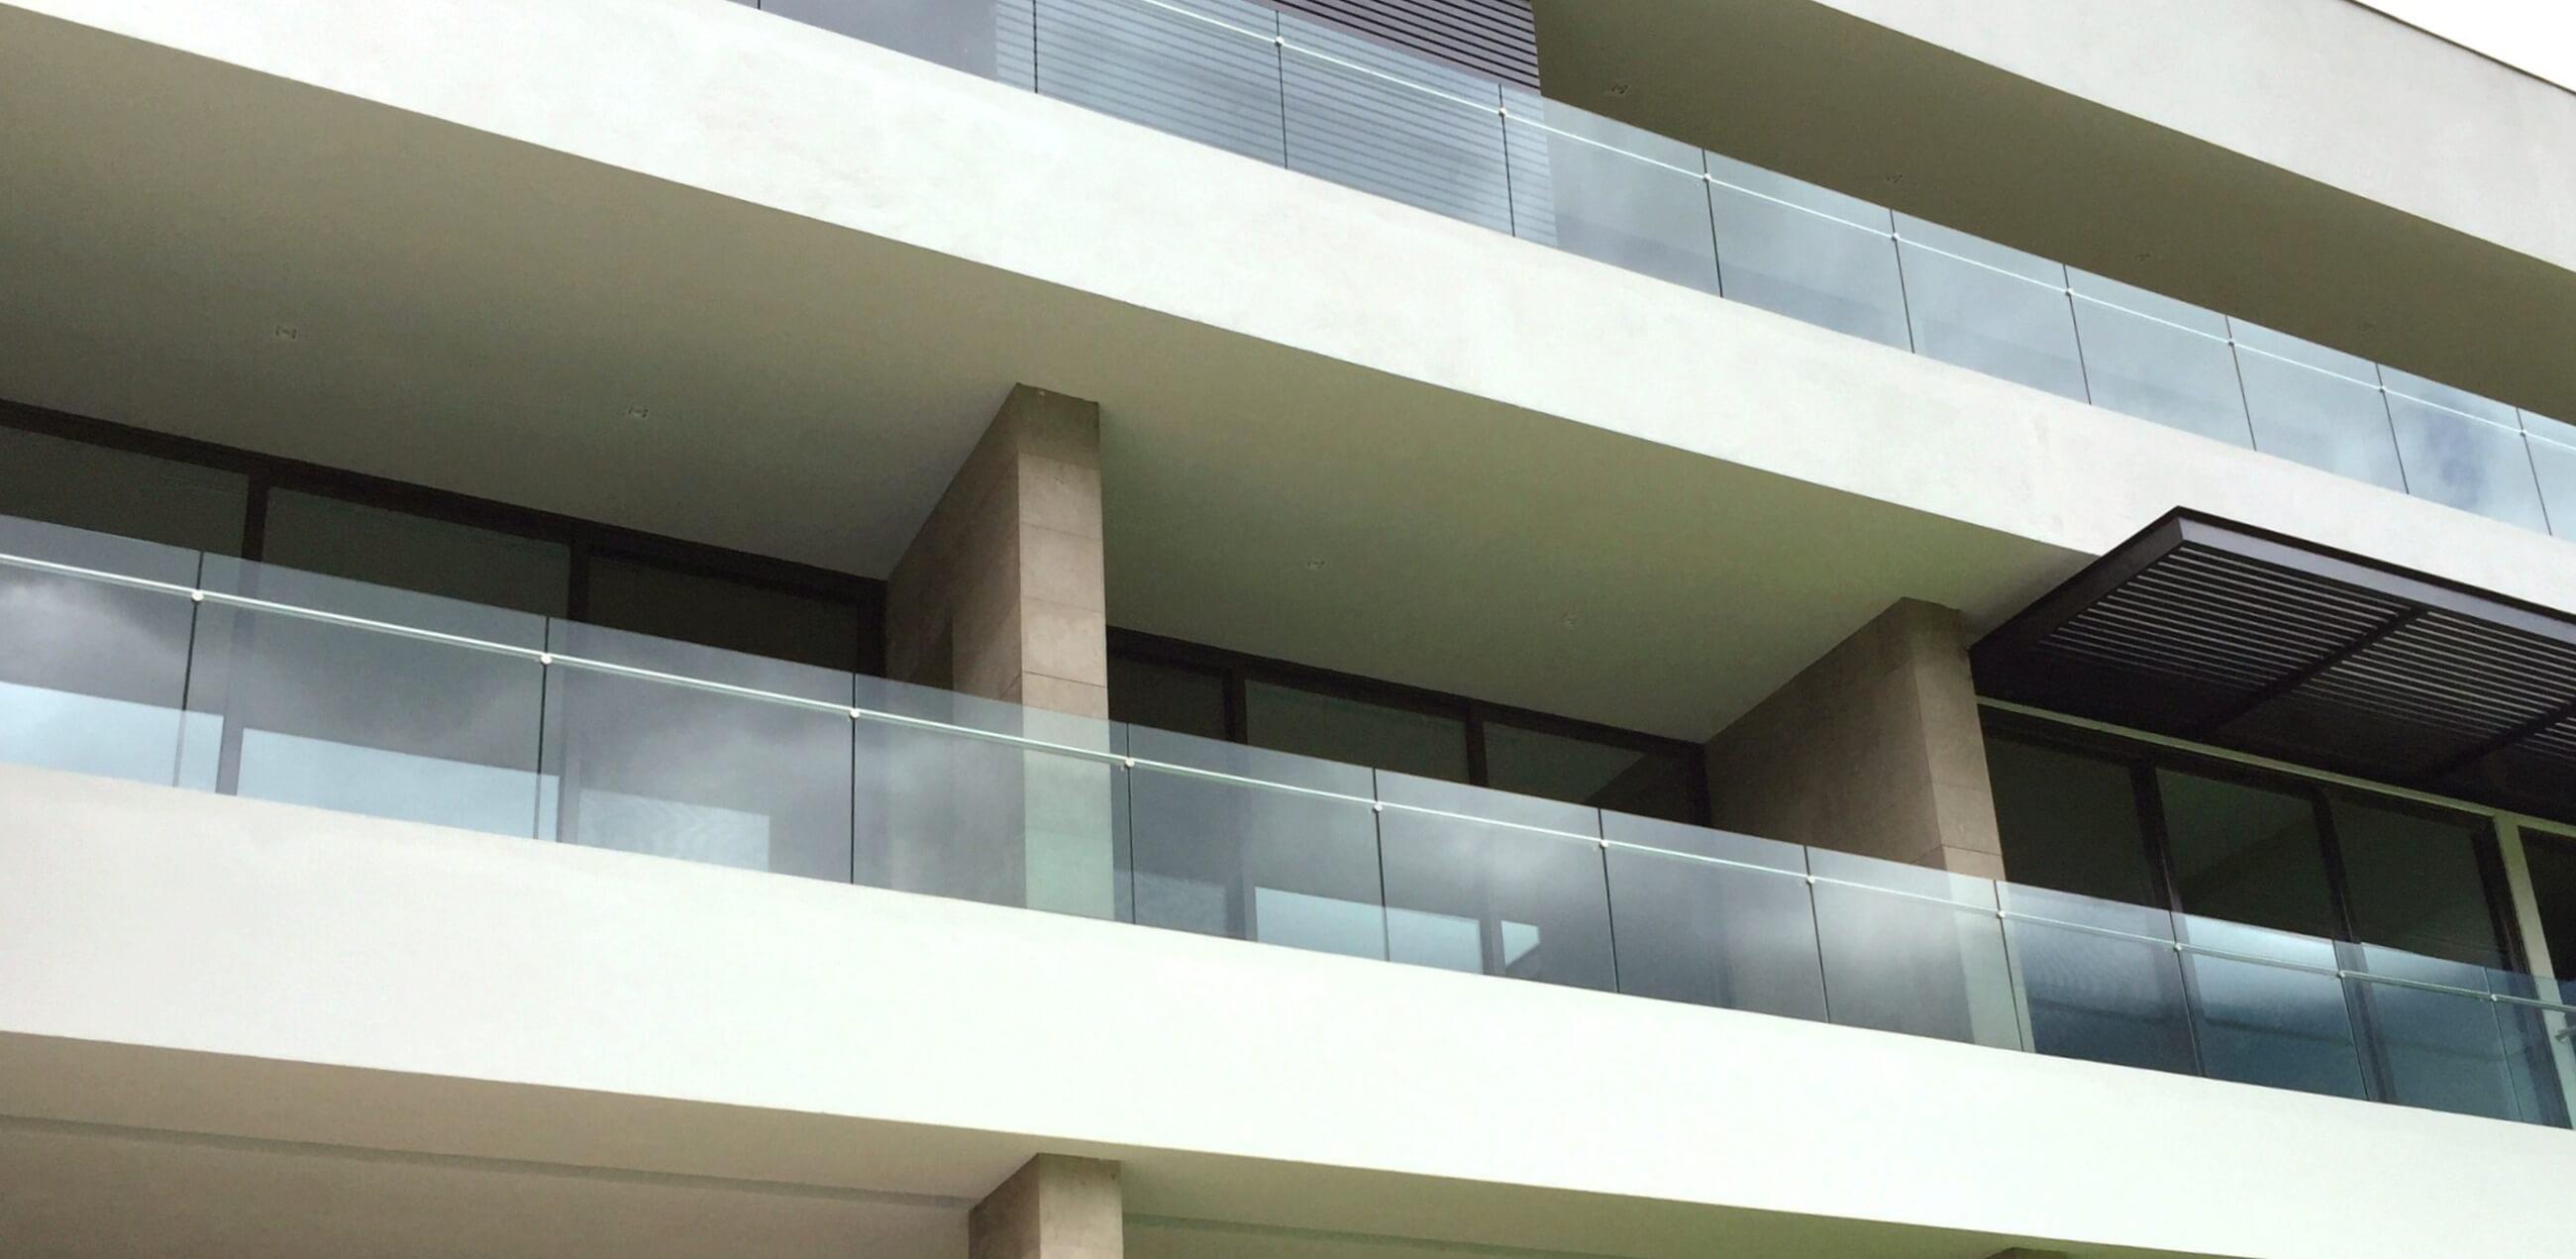 ventanas eurovent premium y barandales d